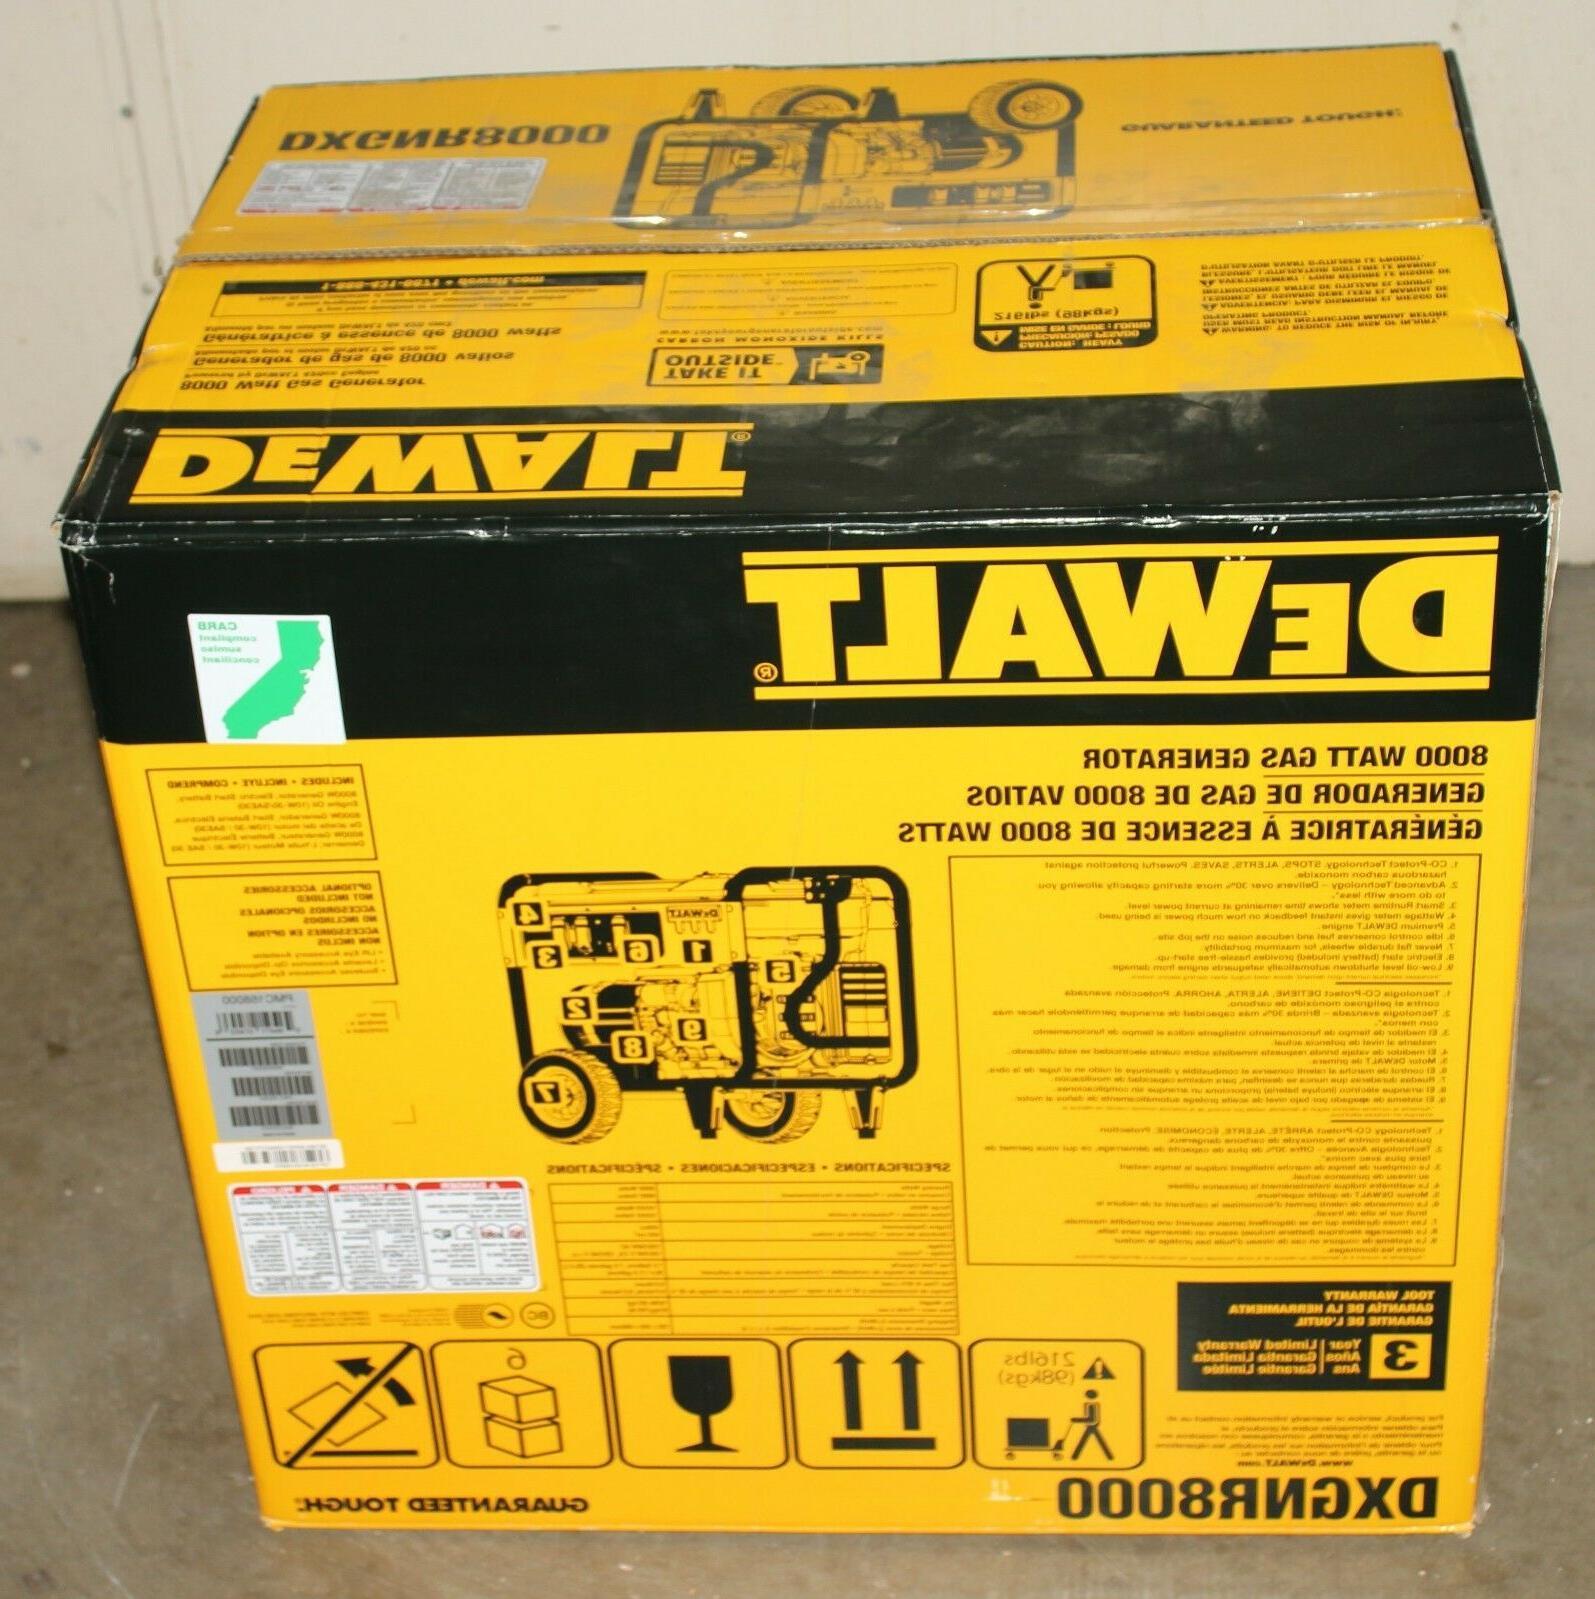 DeWALT Powered Start Portable Generator